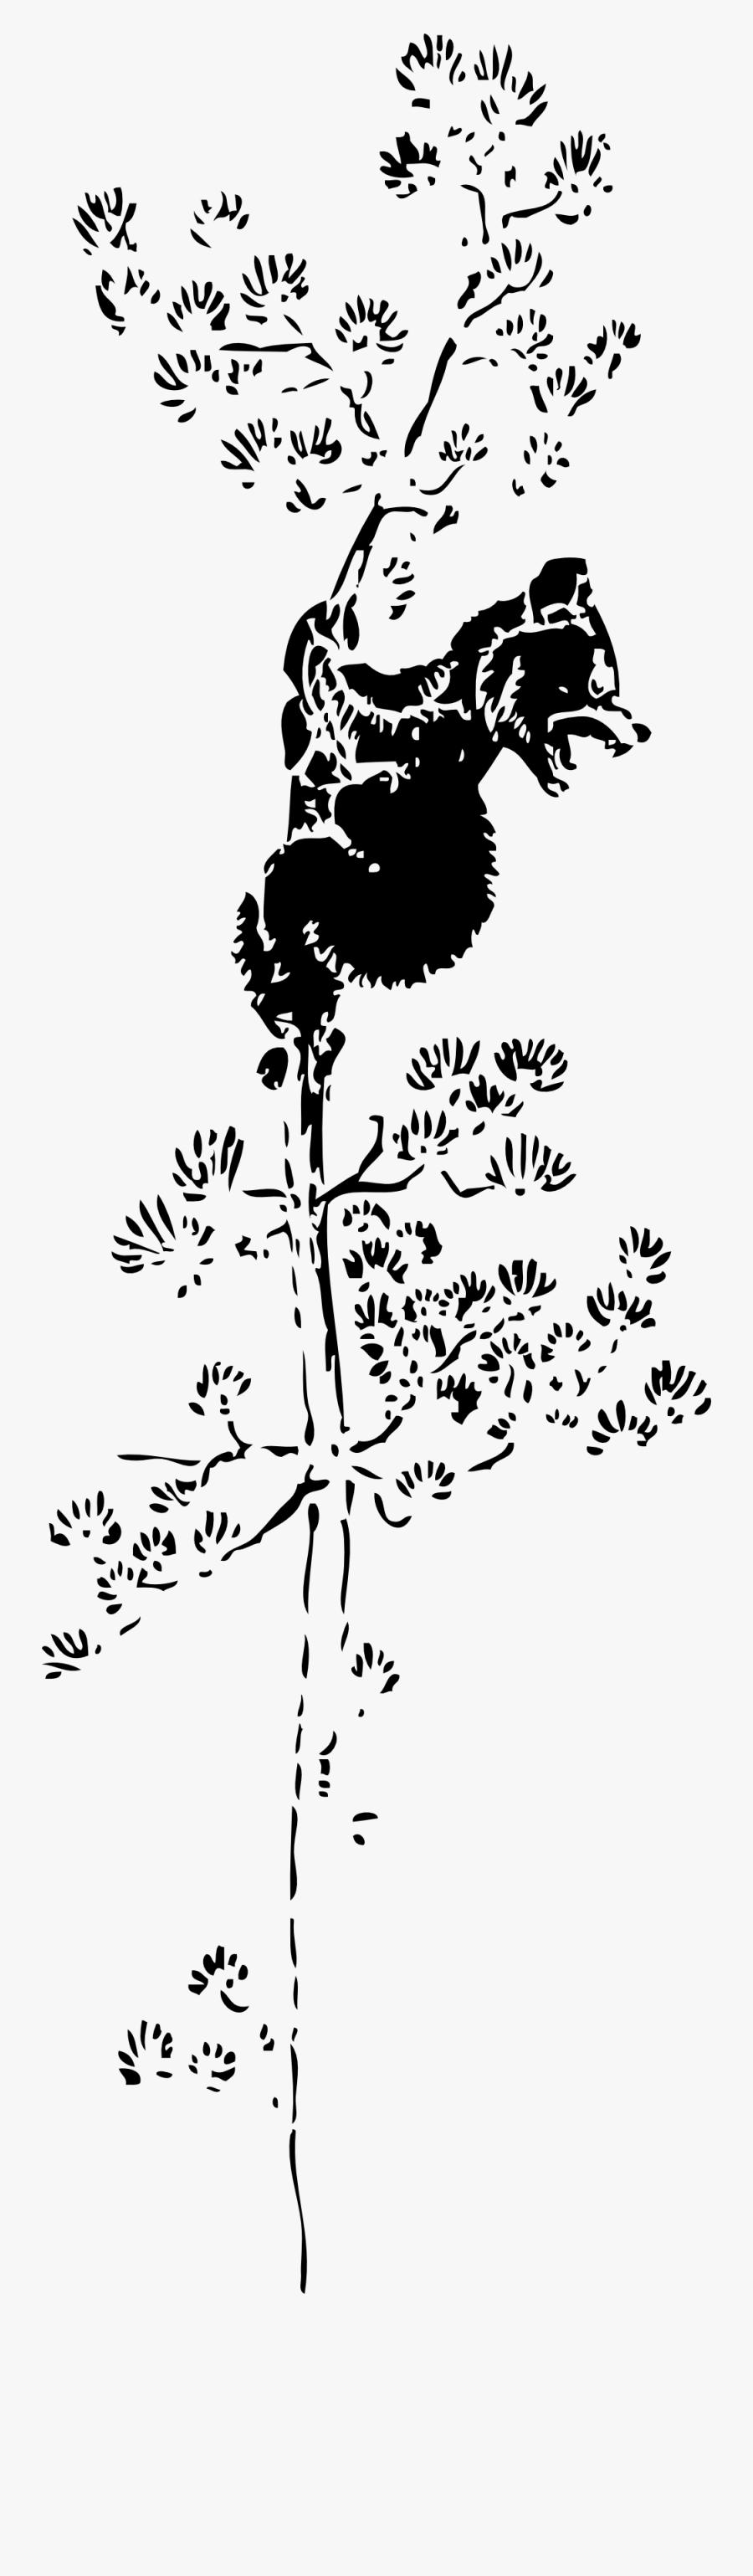 Bear Cub Up A Tree Black White Line Art 555px - Cat On Tree Cartoon Black And White, Transparent Clipart